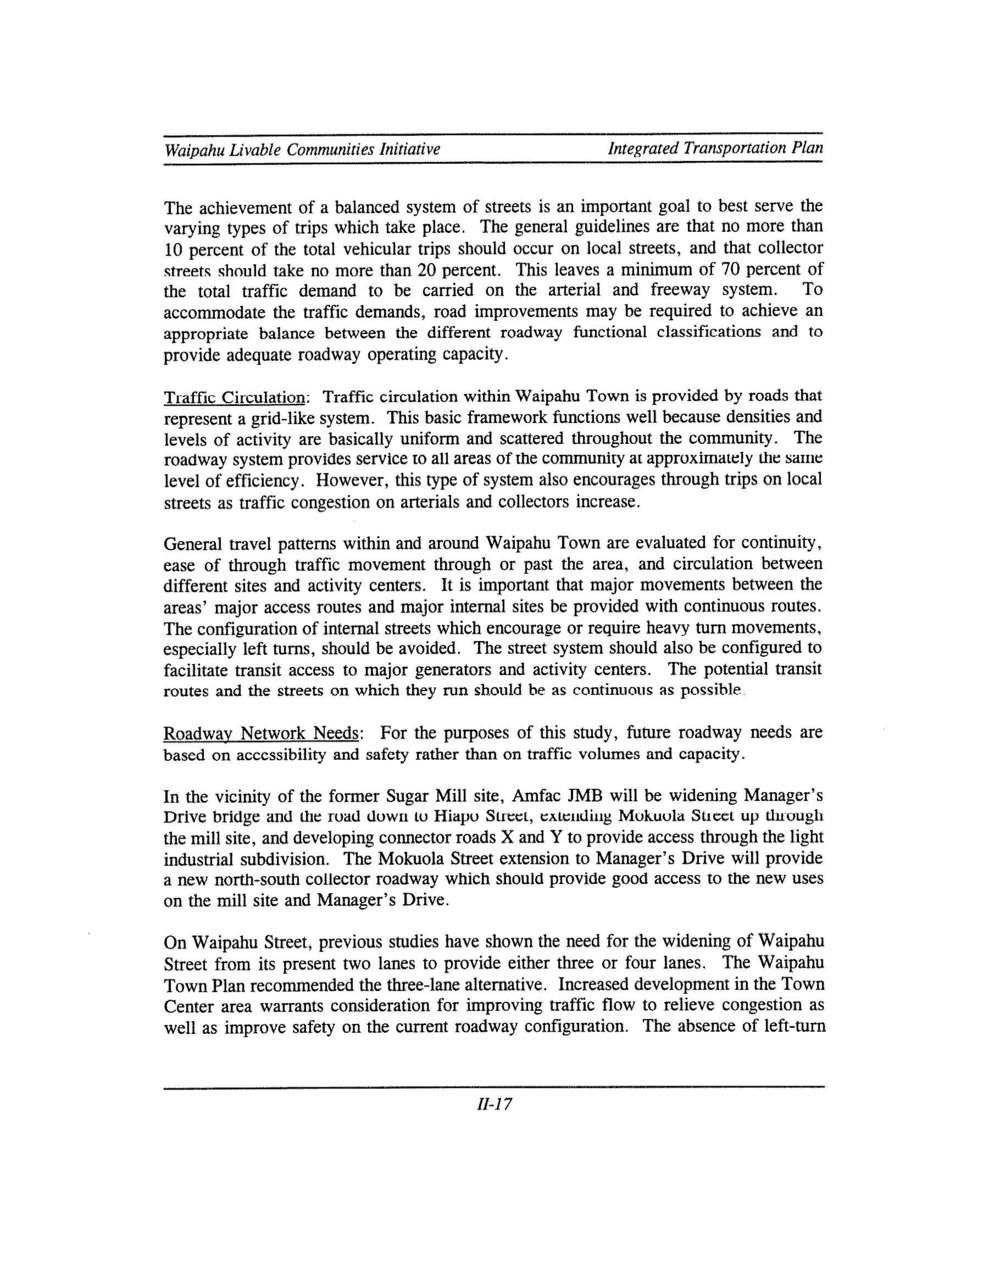 160531_WaipahuLivableCommunities(1998)_Page_032.jpg